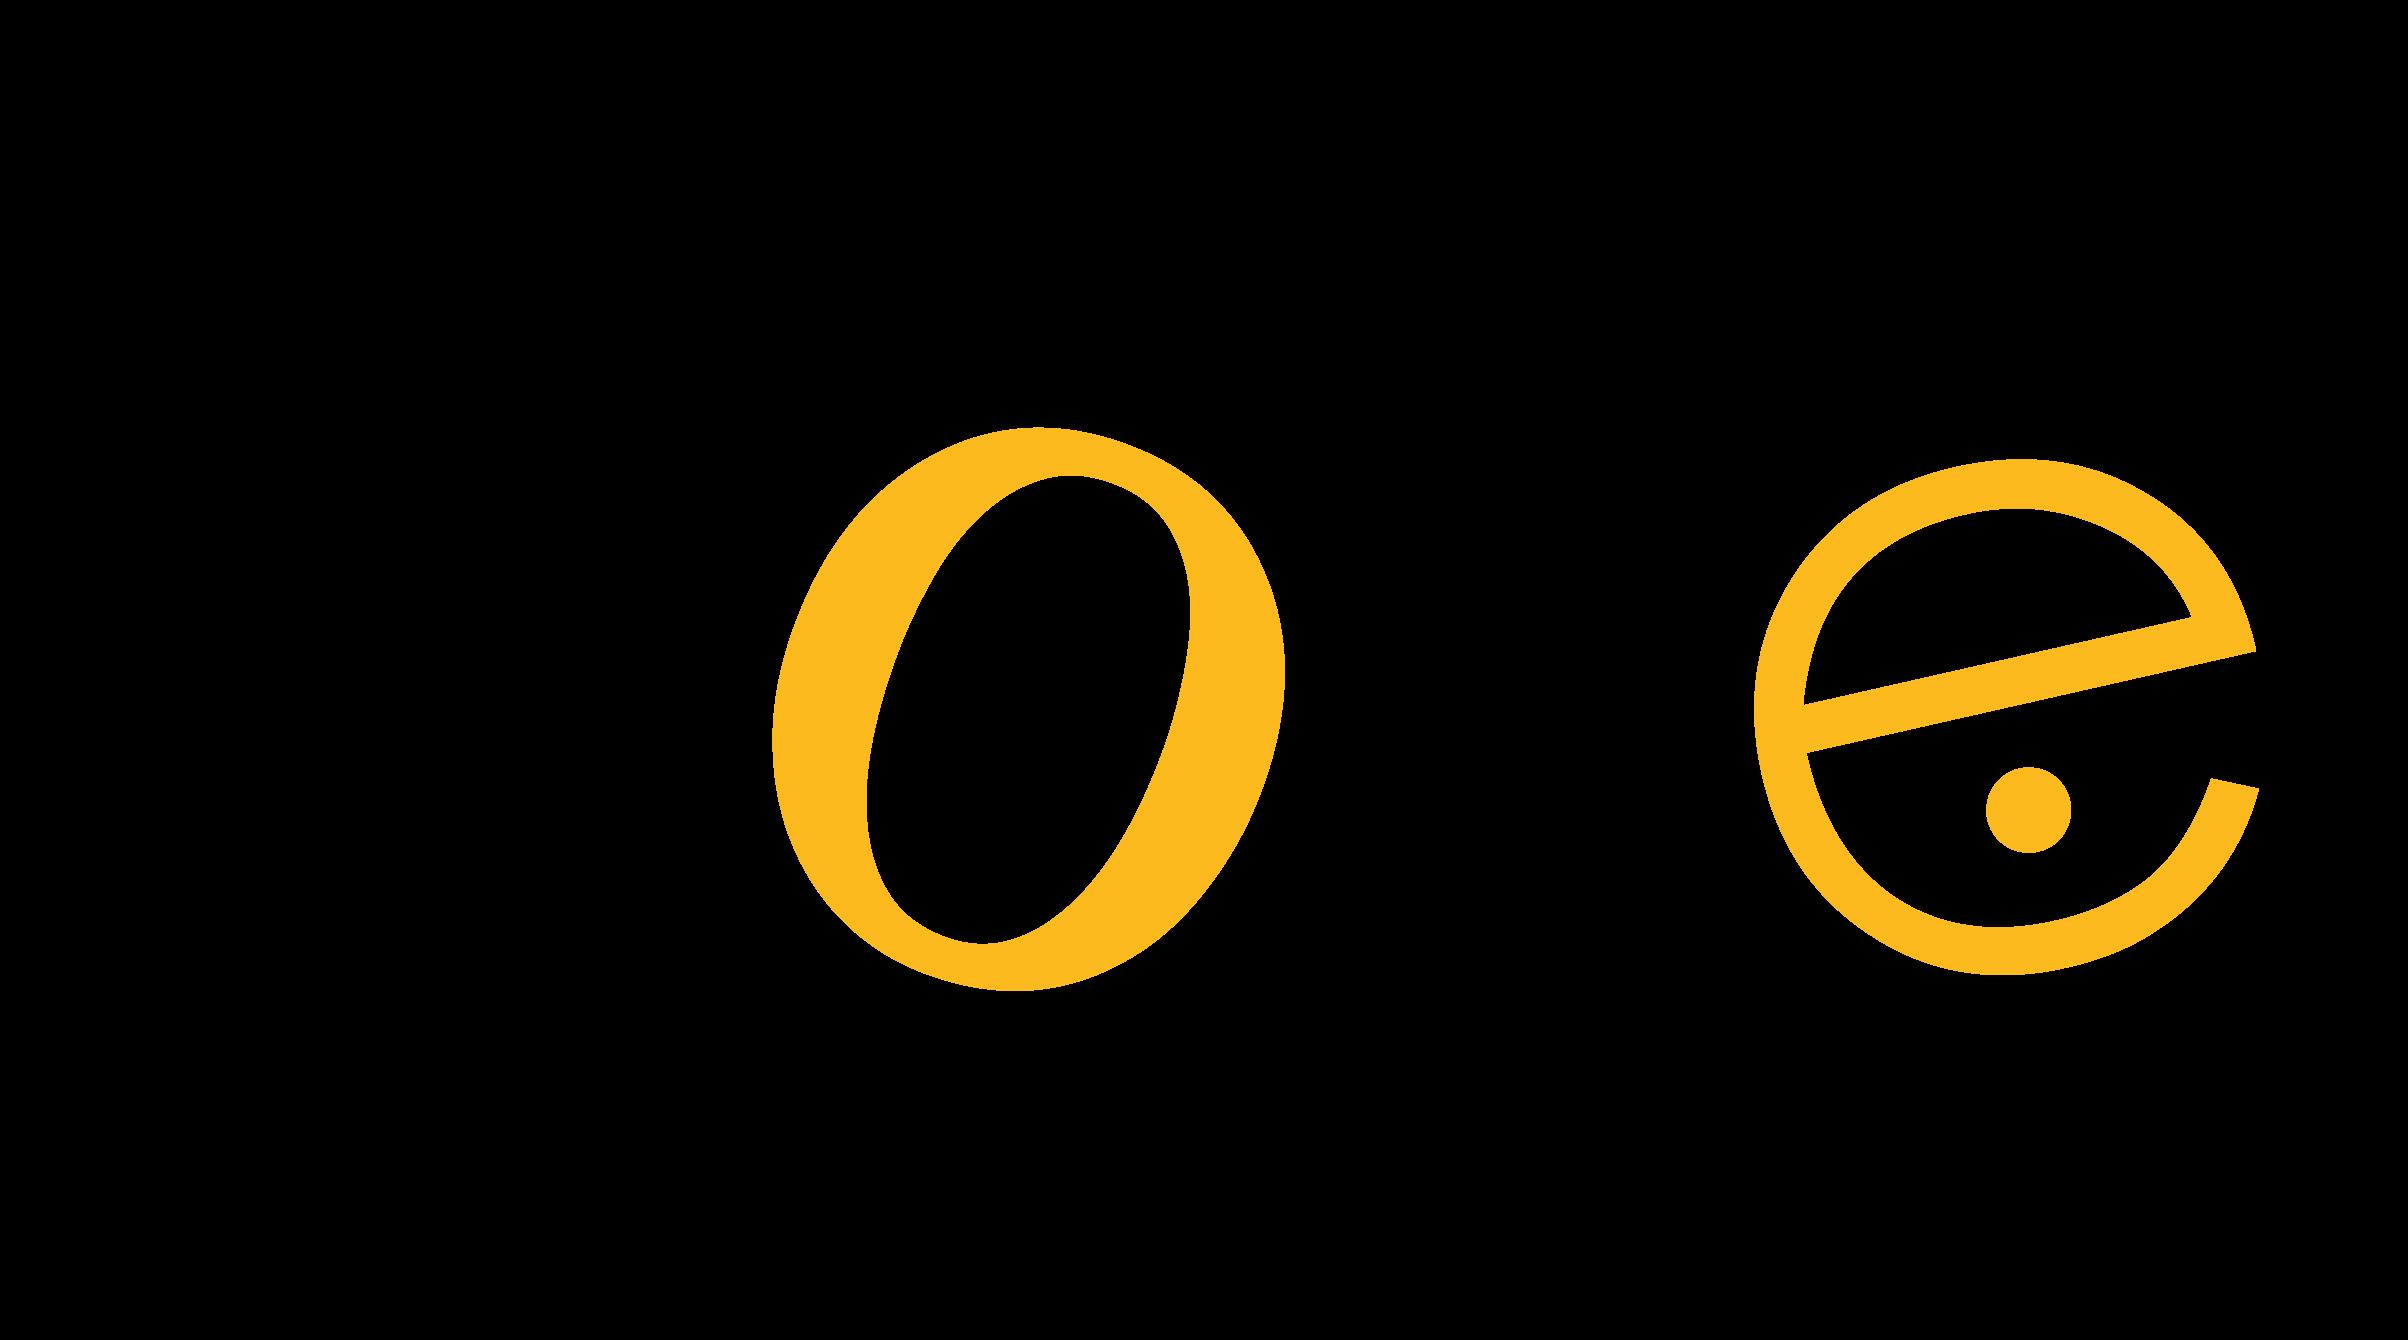 H.O.P.E. (Hispanic Organization Promoting Education)